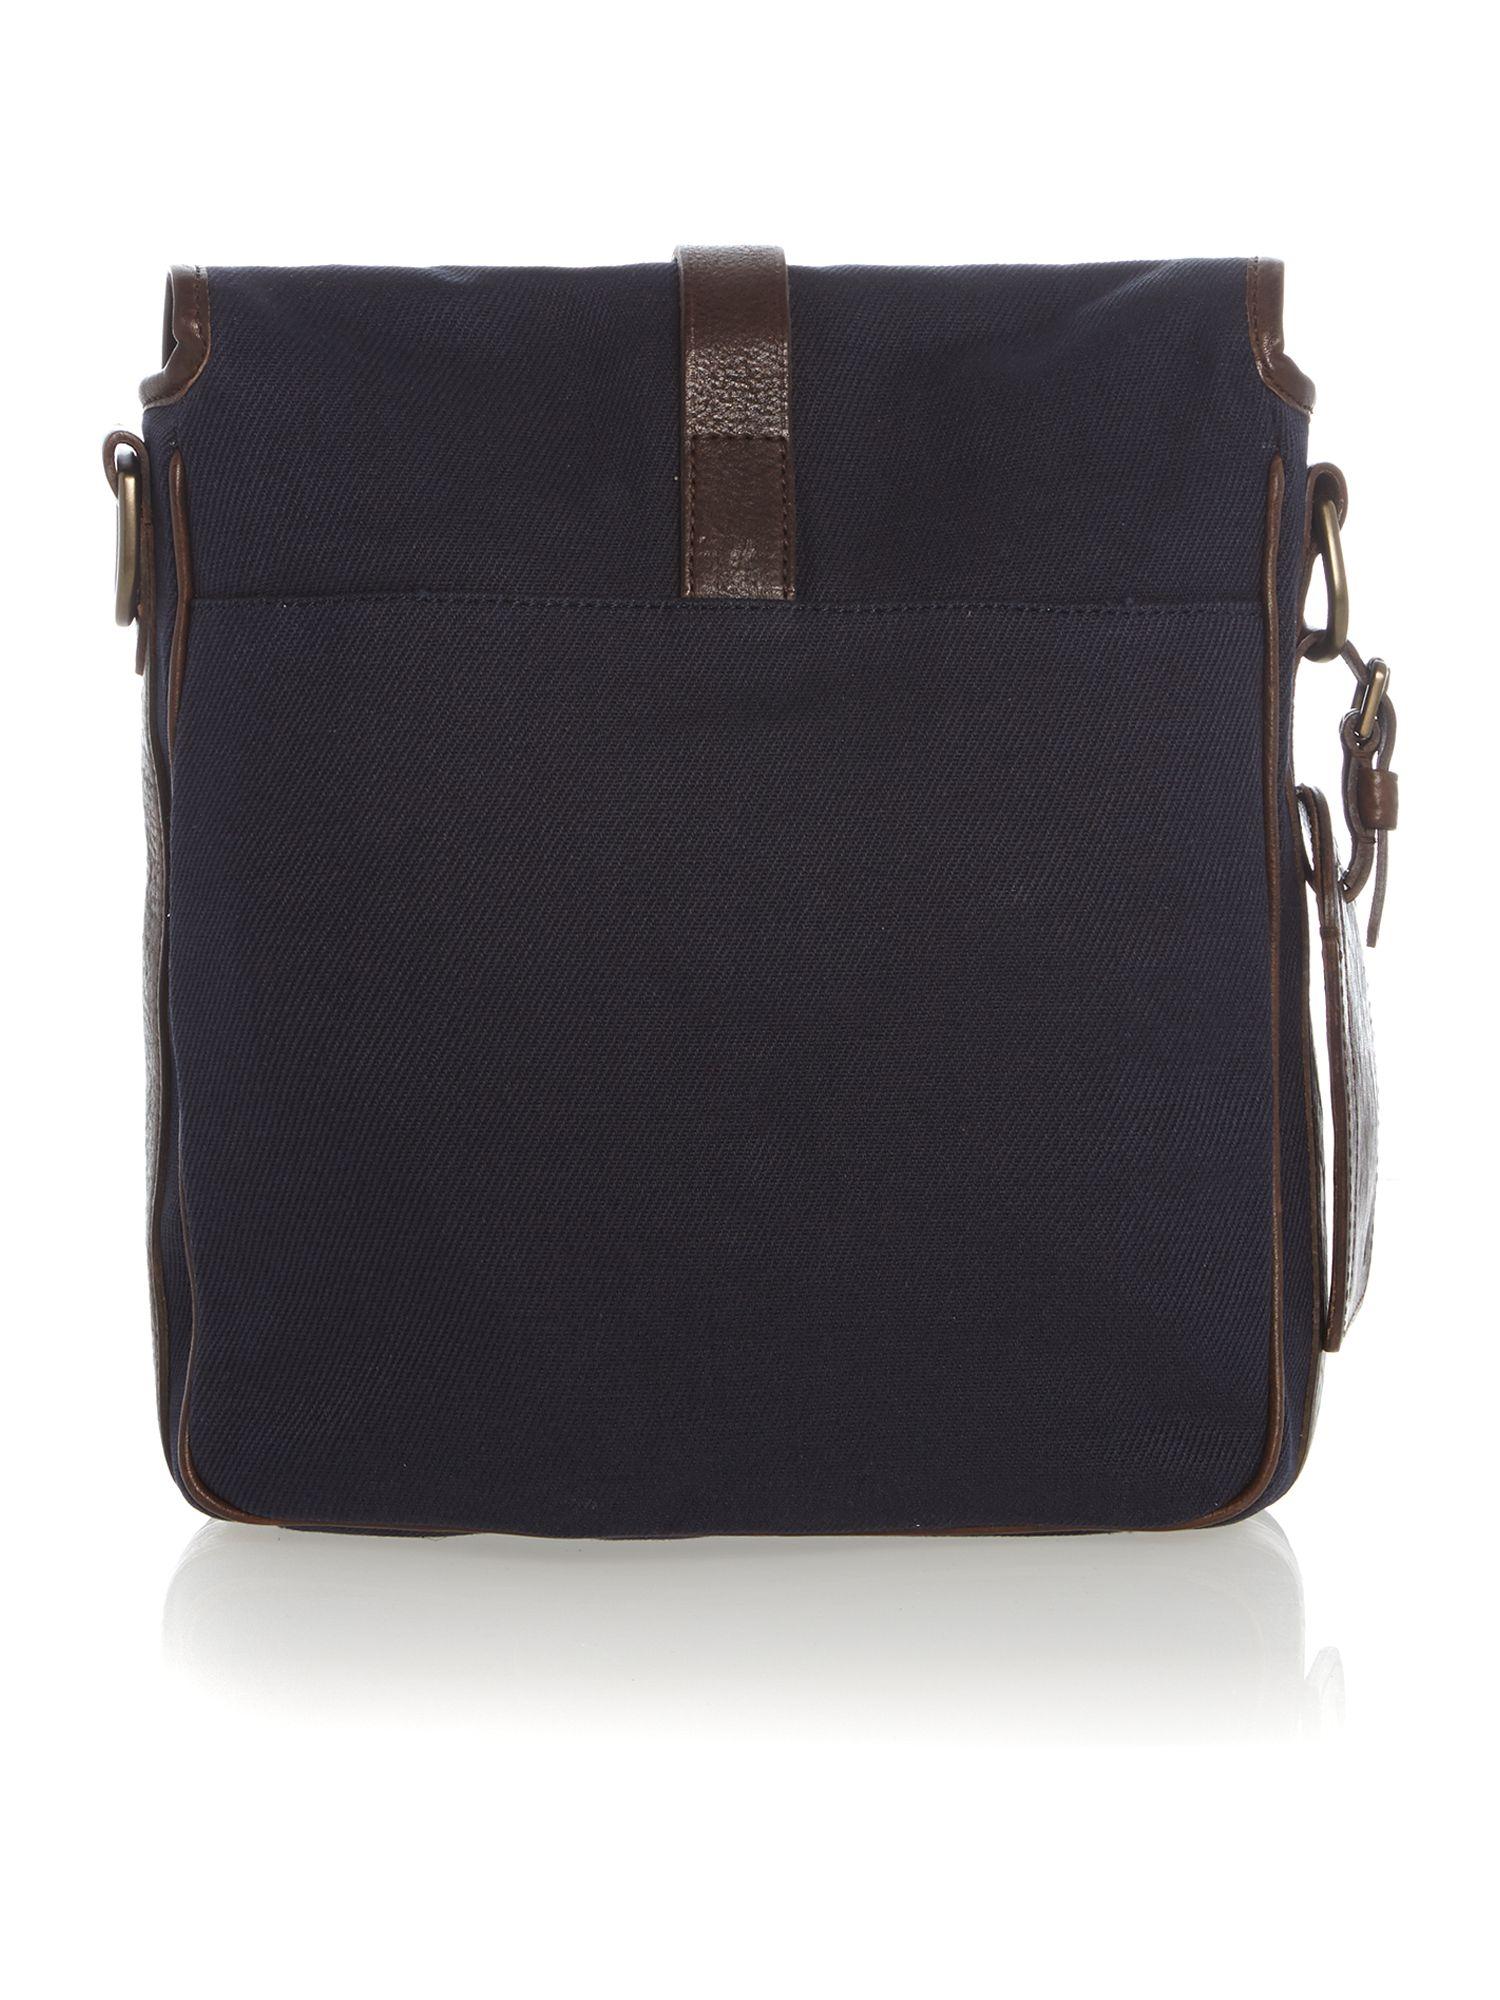 Polo ralph lauren Man Pouch Bag in Blue for Men | Lyst